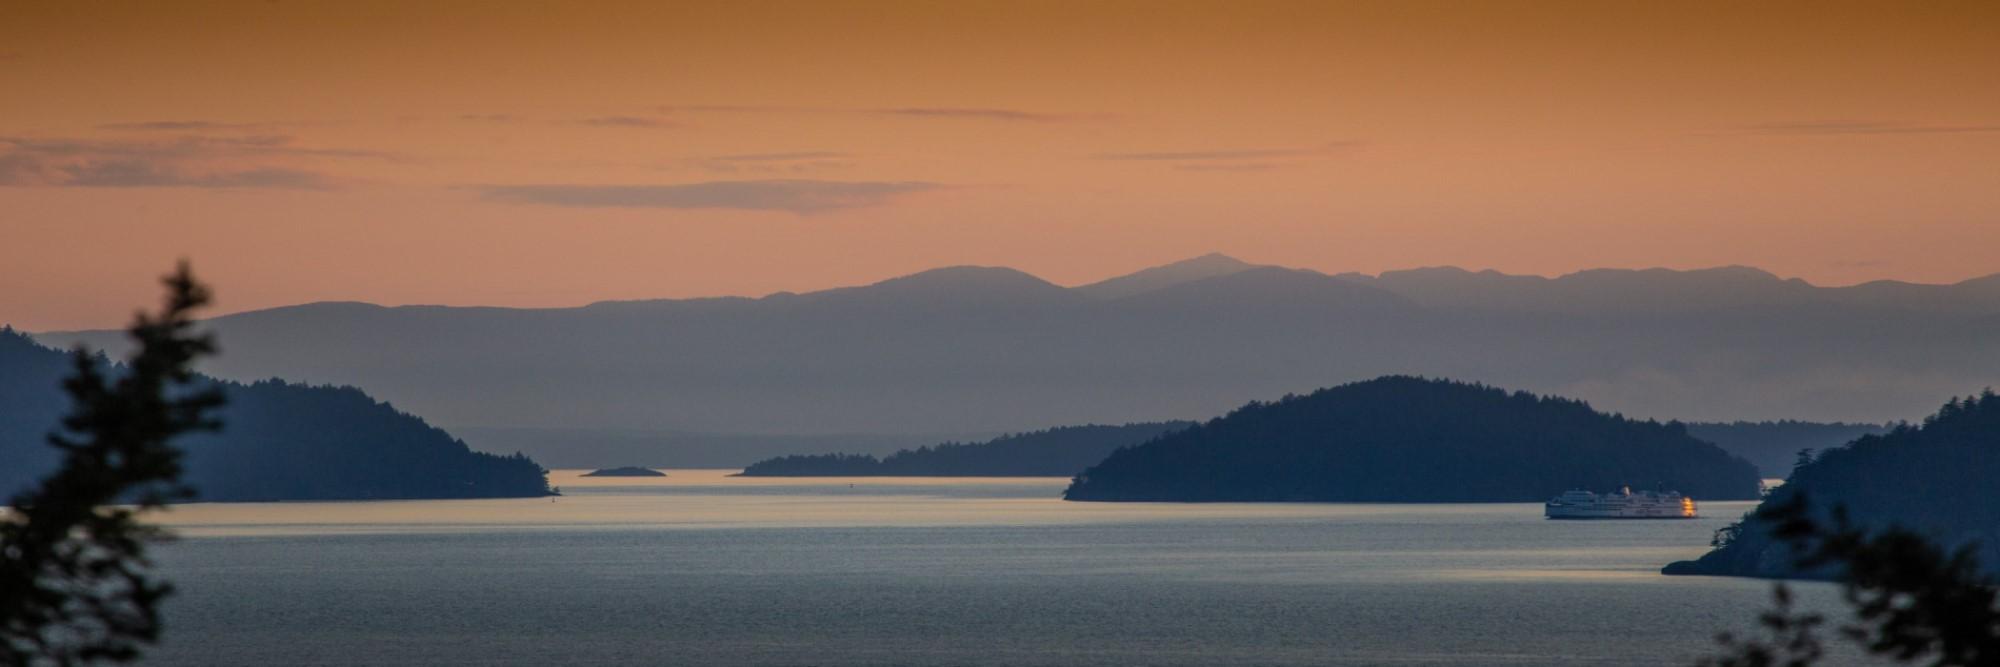 San Juan Islands with sunset over the cascade mountains